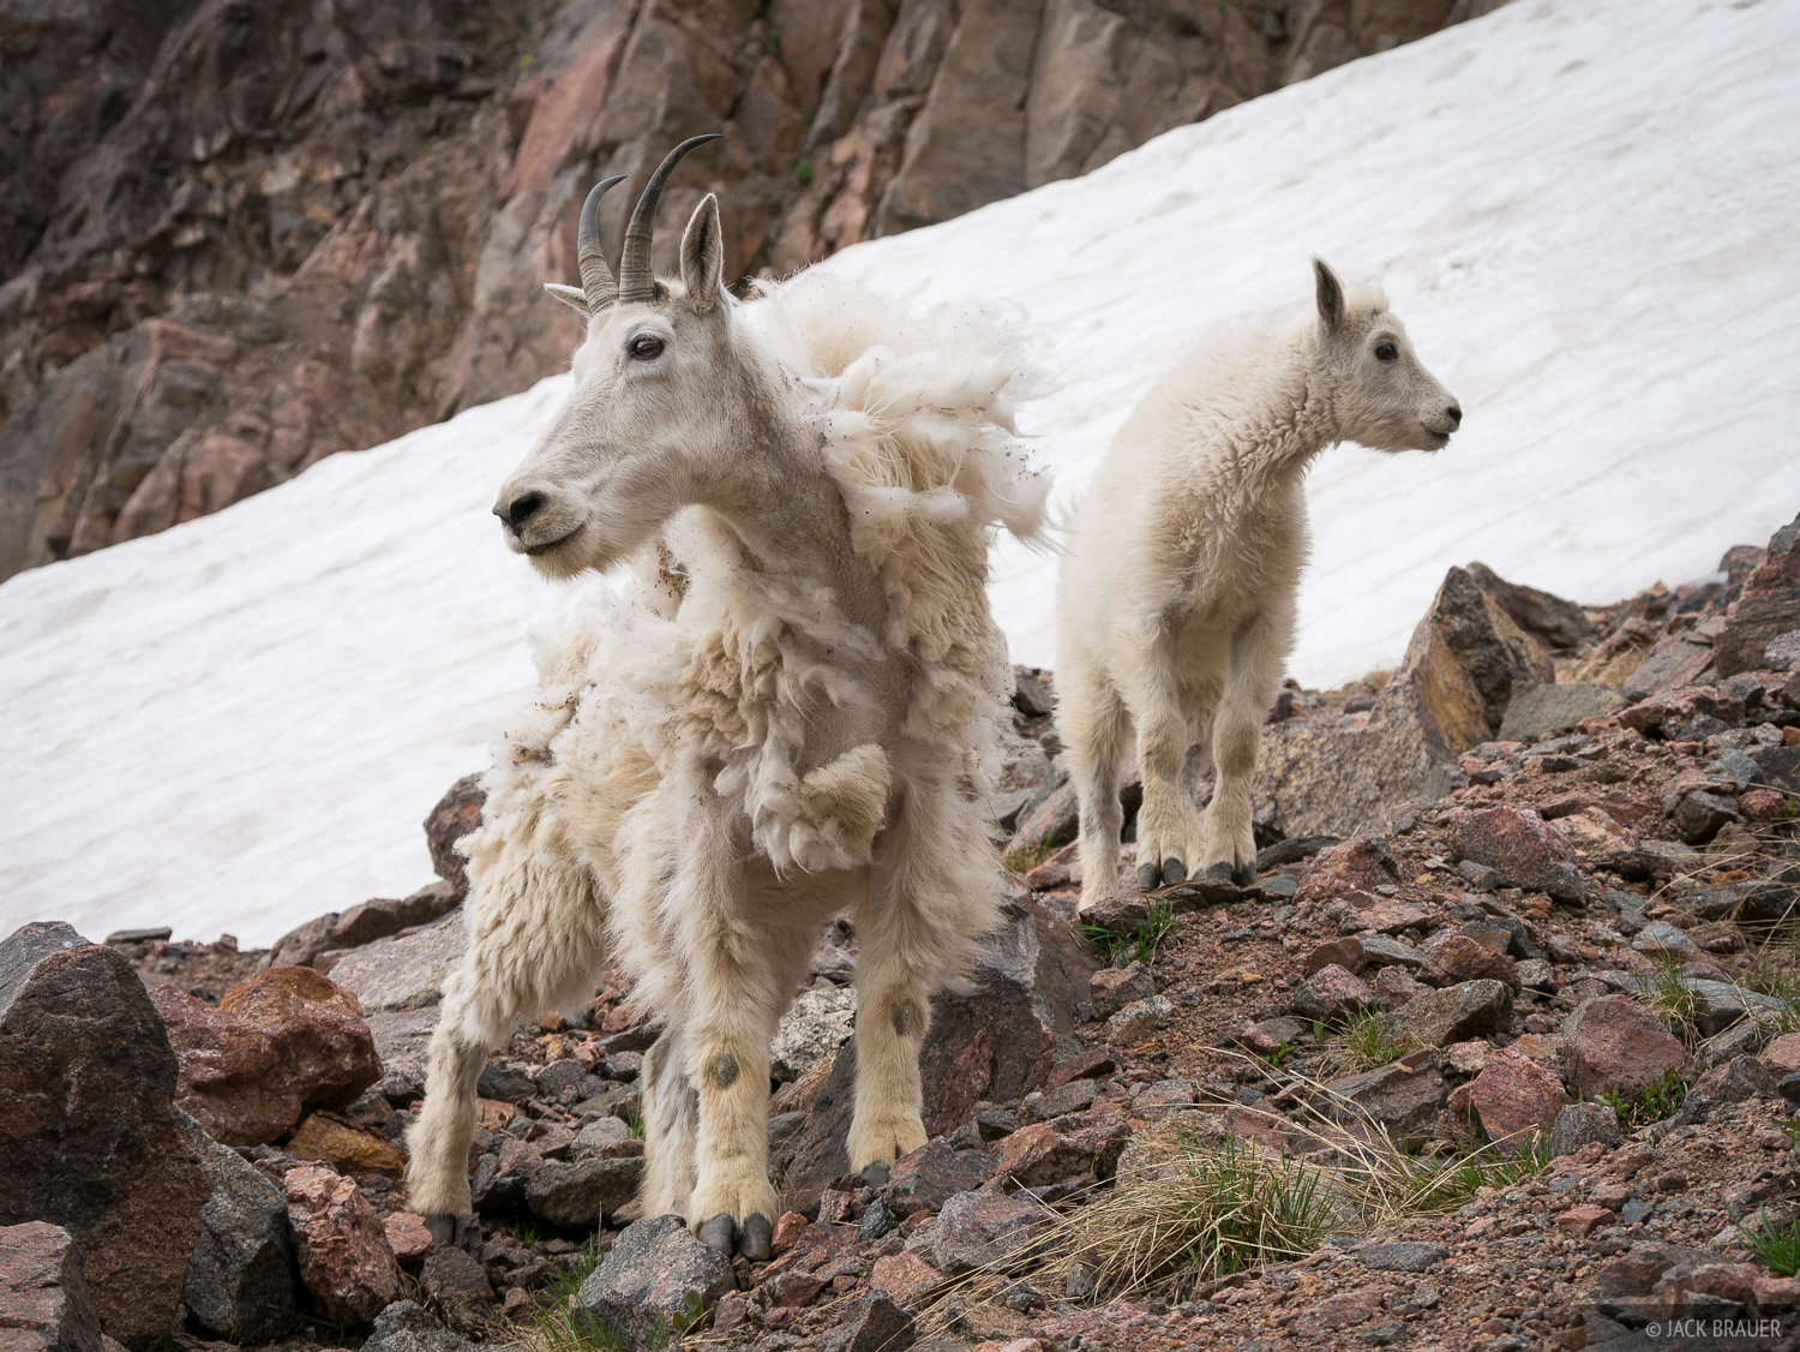 Colorado, Gore Range, mountain goat, Eagles Nest Wilderness, Kneeknocker Pass, photo